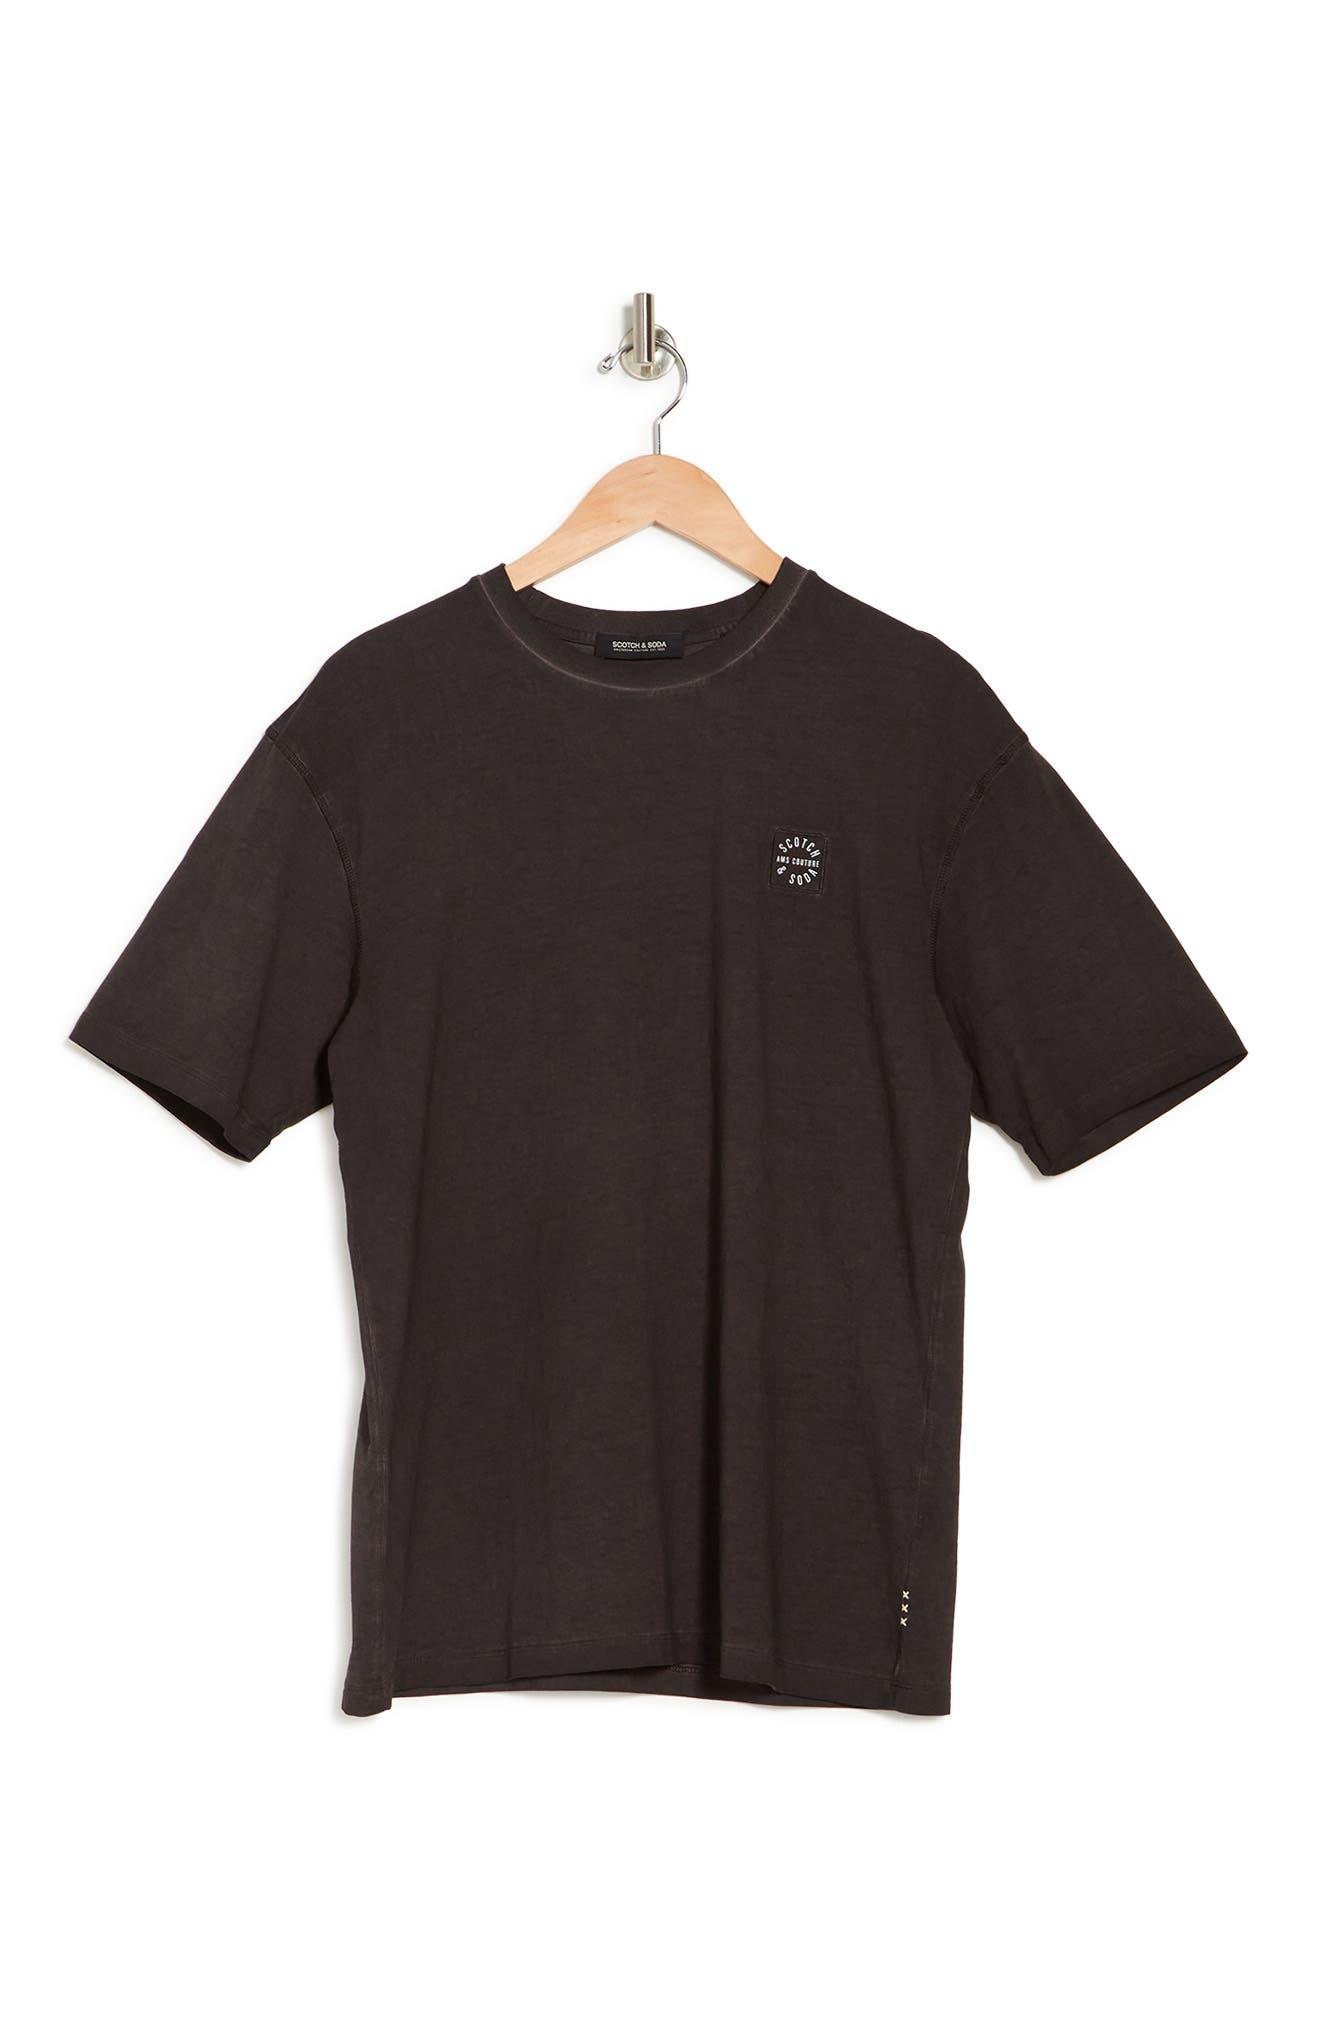 Scotch & Soda Oversized Oil Wash Crewneck T-shirt In 3499-bordeaubergine